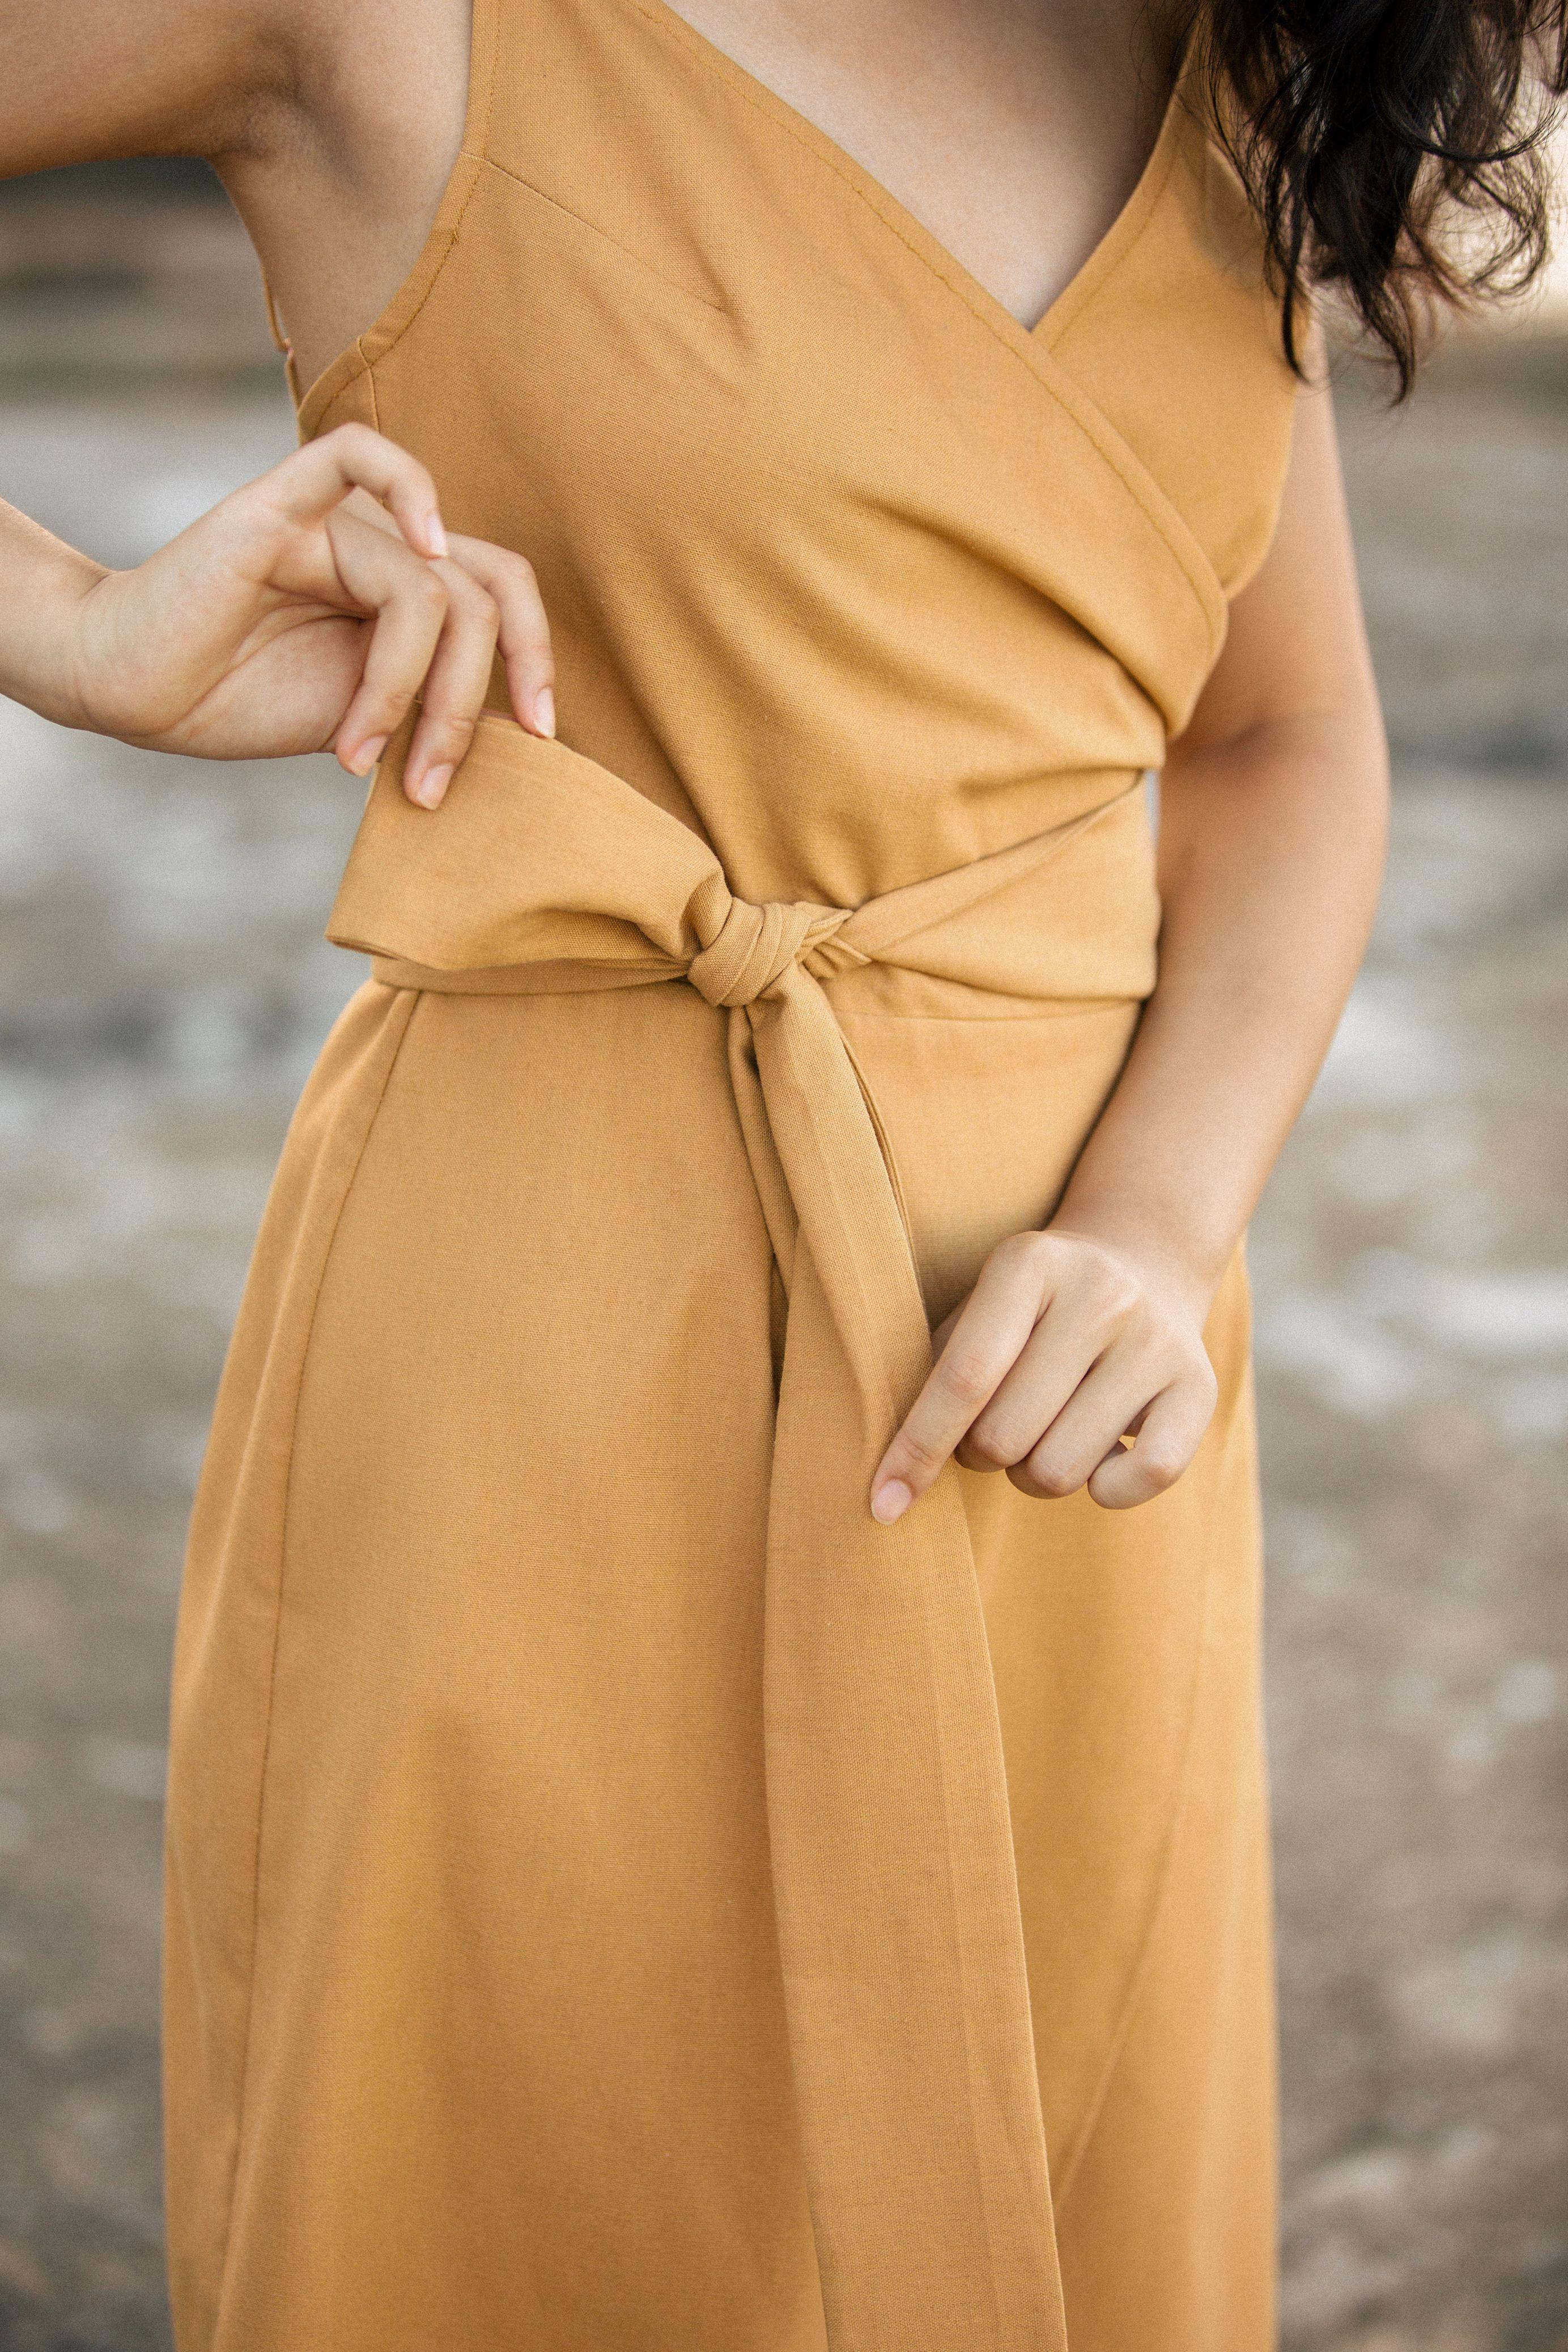 88c9bf3266 Bridesmaid wrap dress in mustard. Linen midi dress with spaghetti straps  and sash. Great